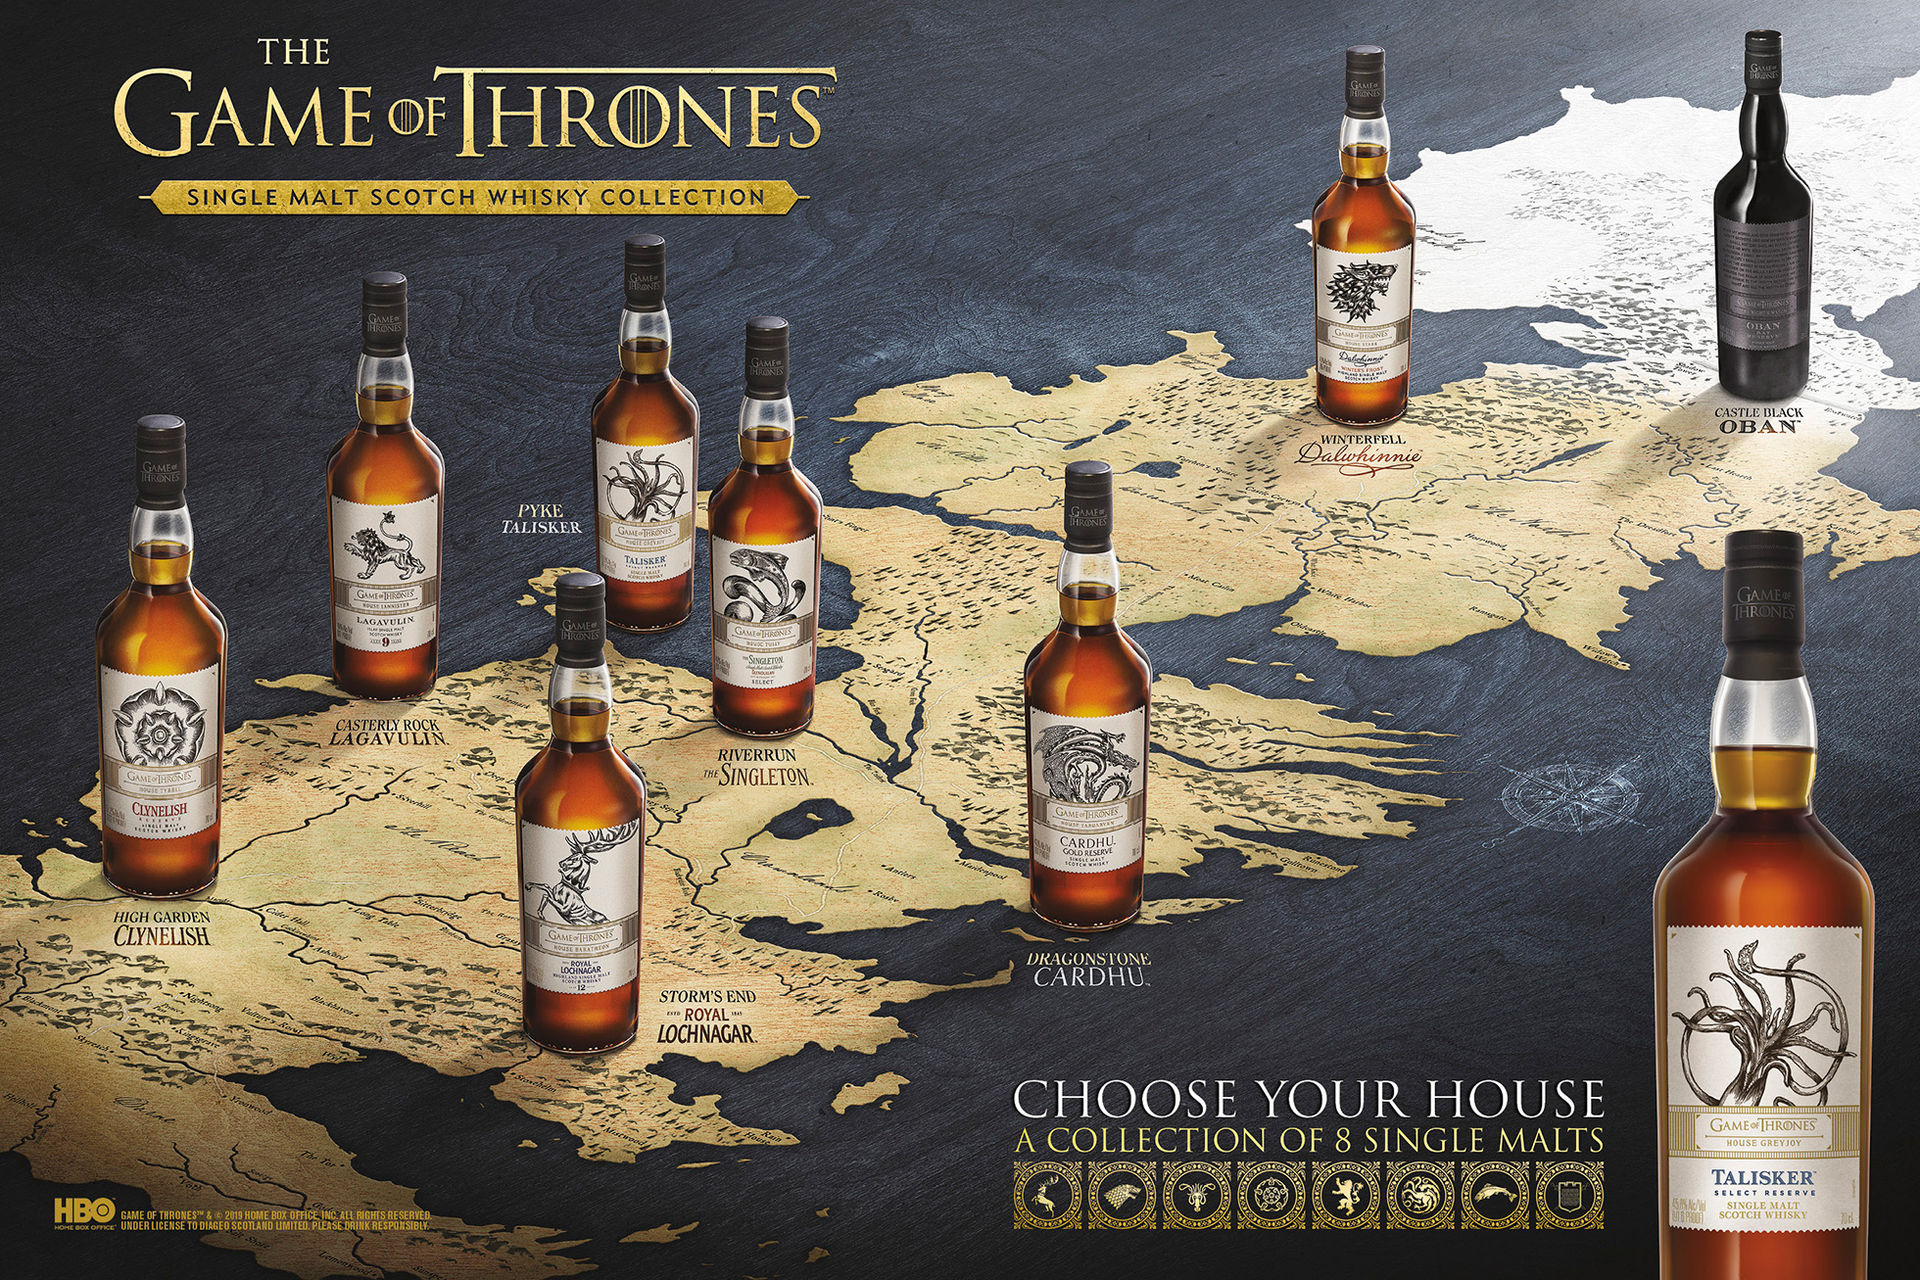 8 stycken flaskor med Game of Thrones-whisky